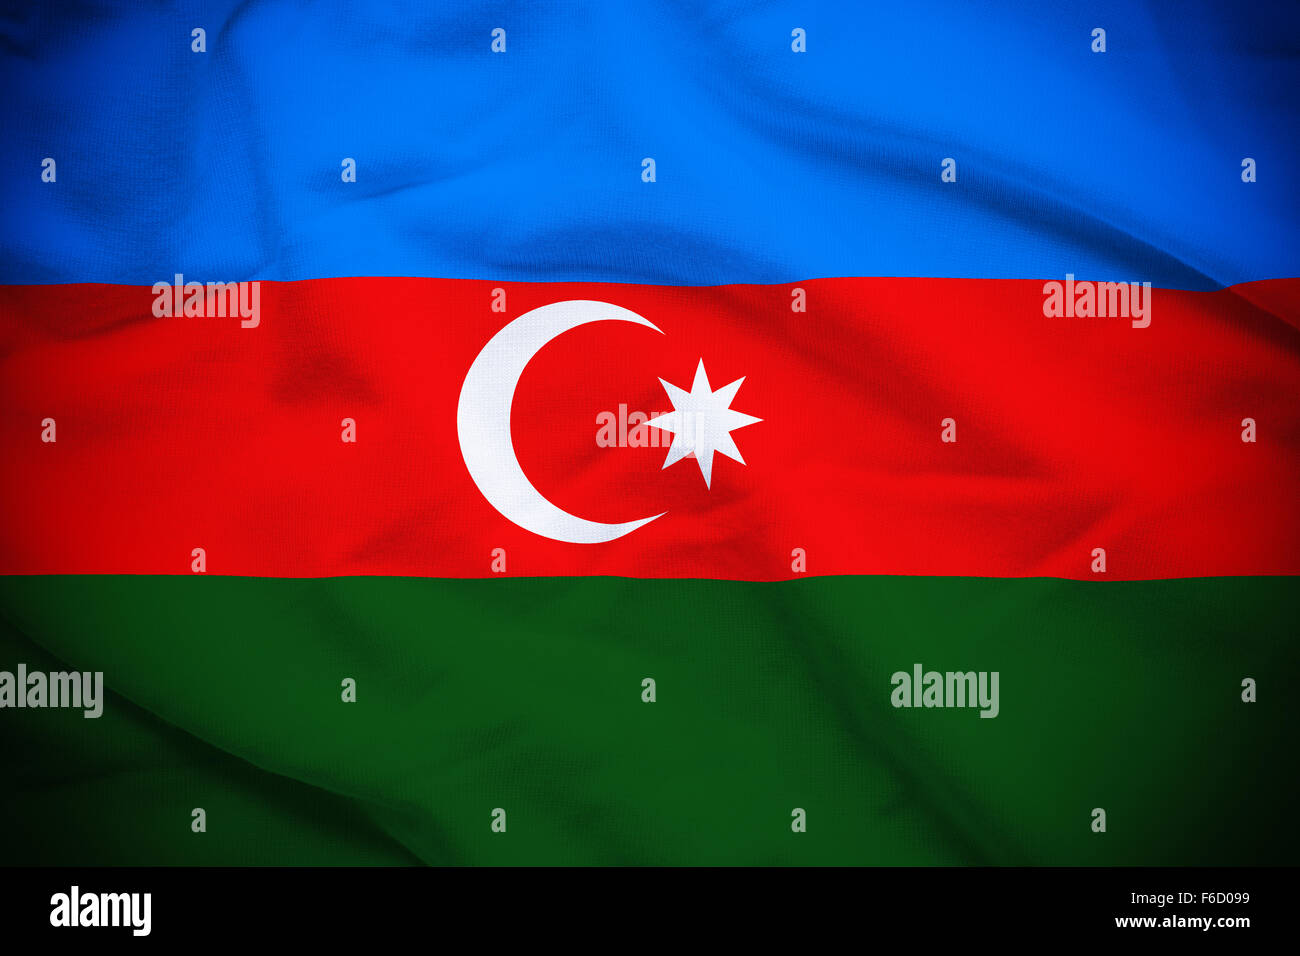 Wavy and rippled national flag of Azerbaijan background. - Stock Image